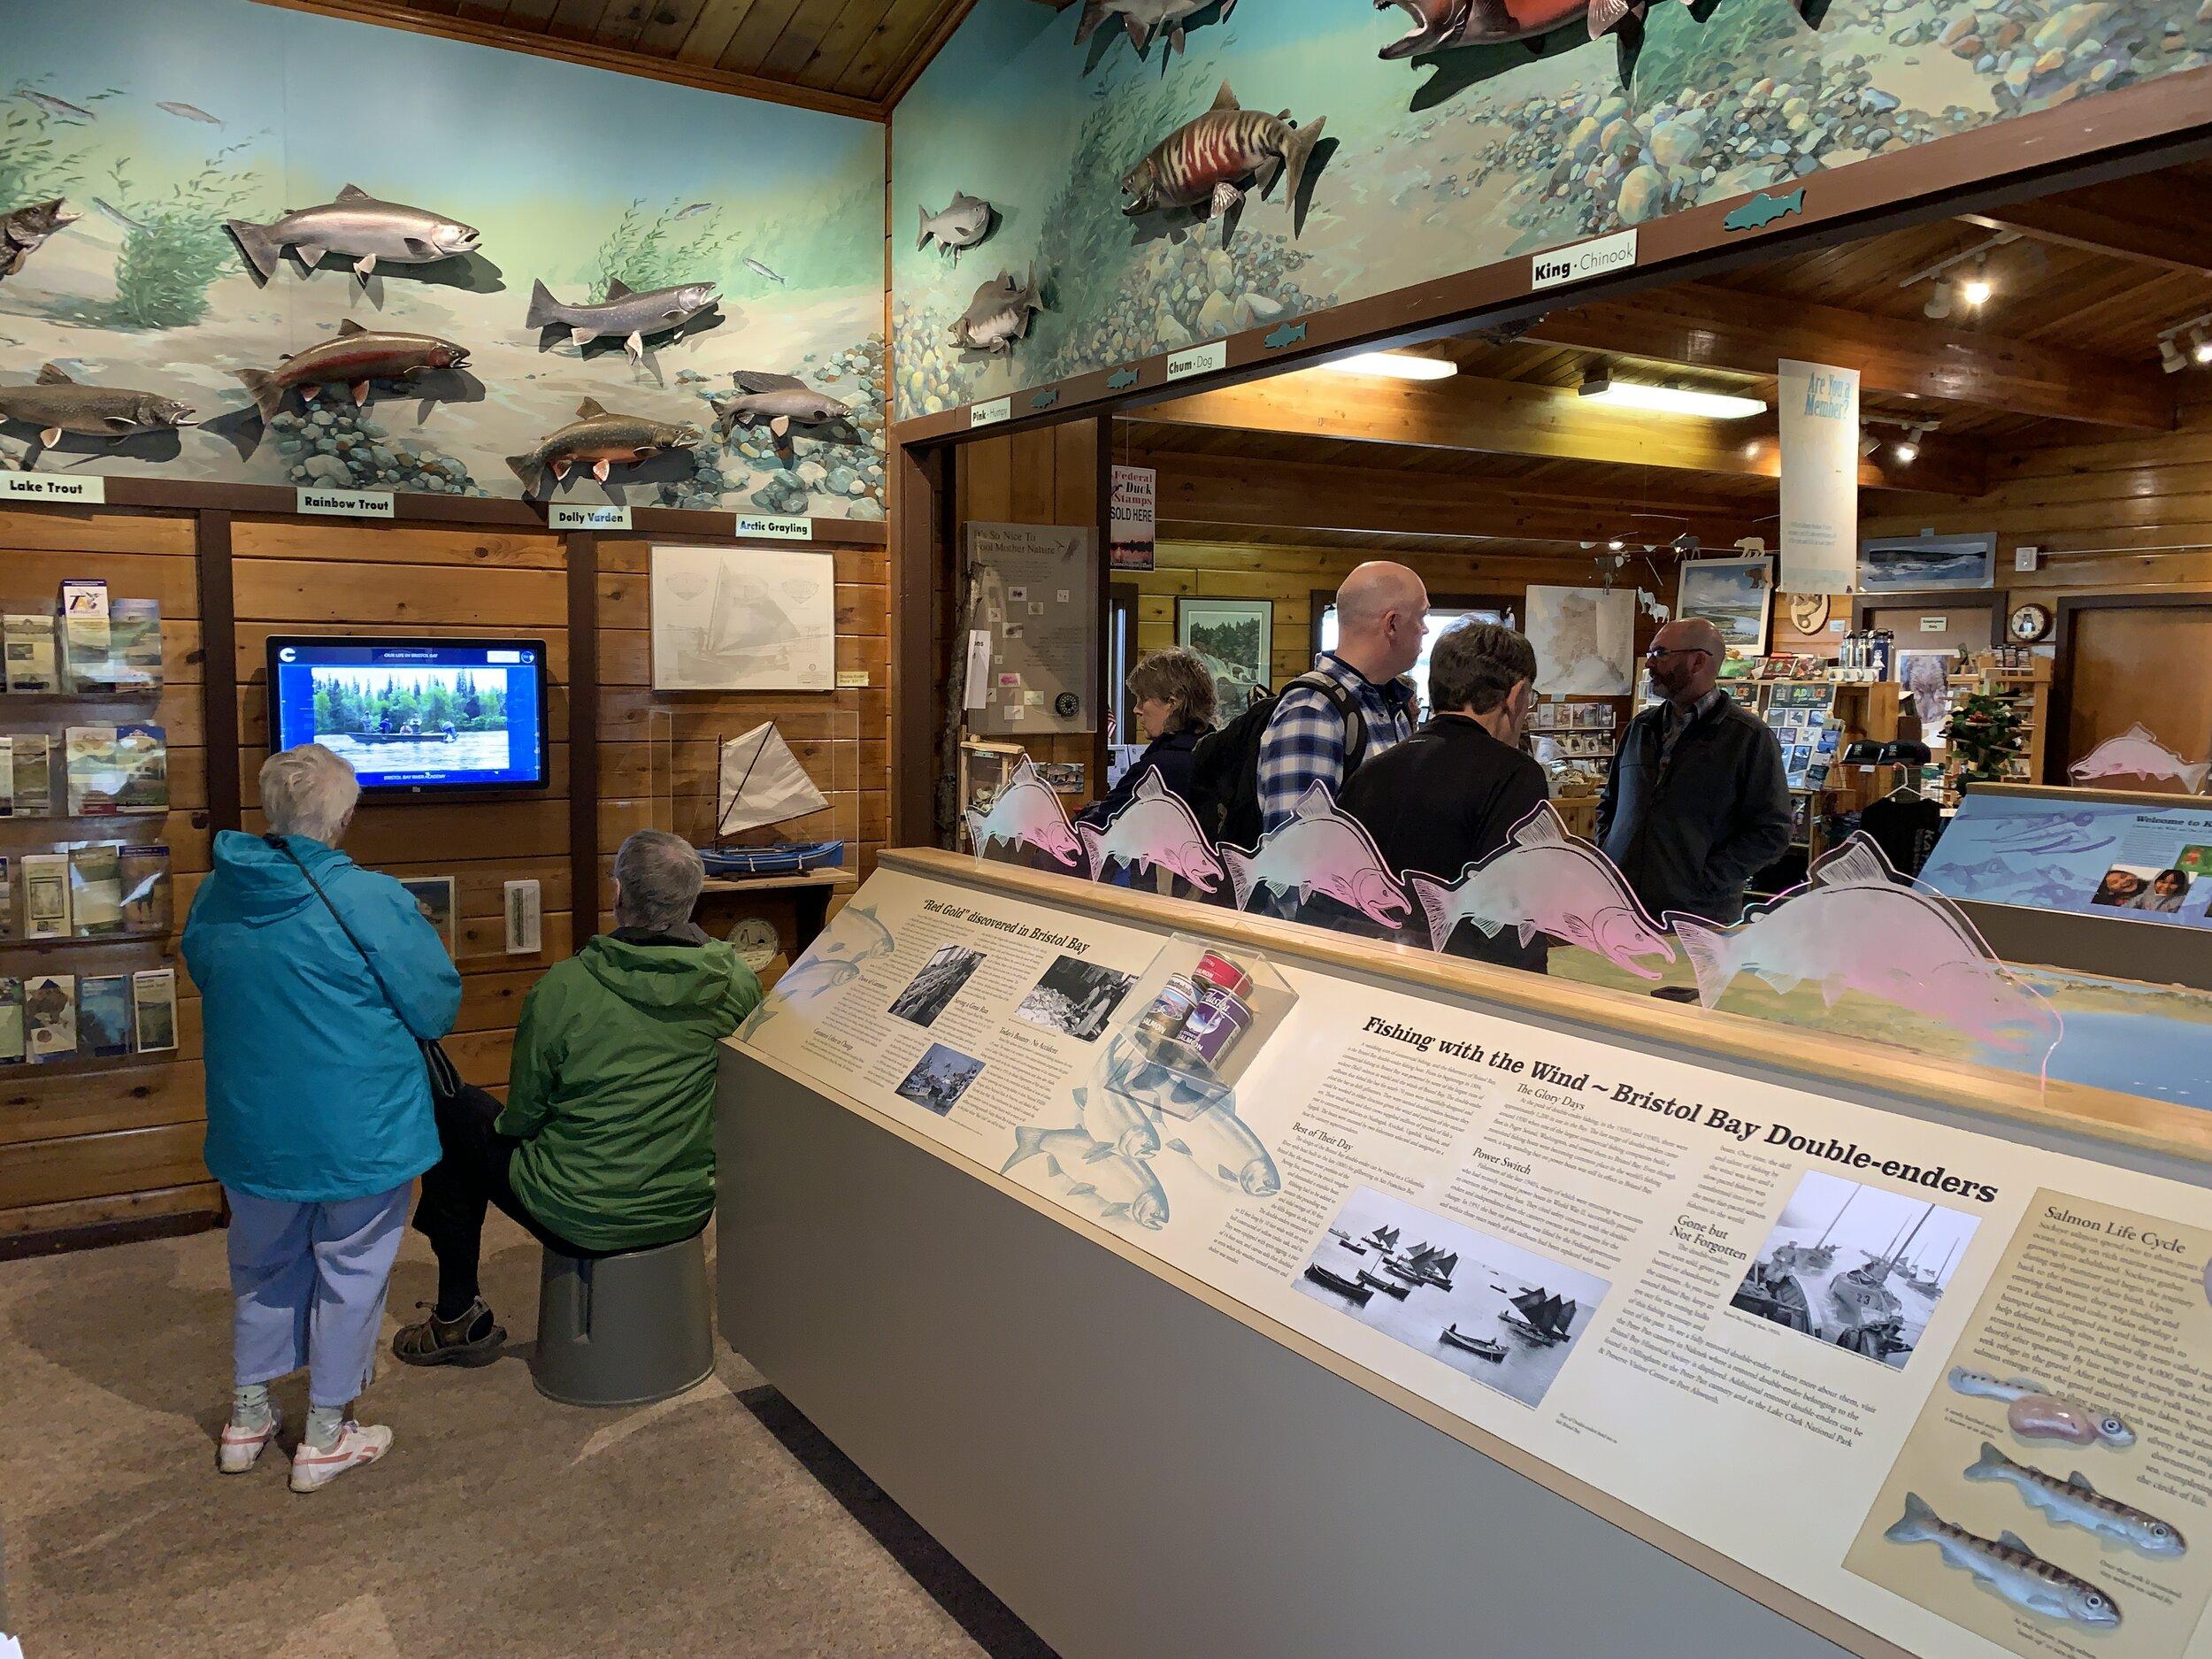 King Salmon Visitor Center